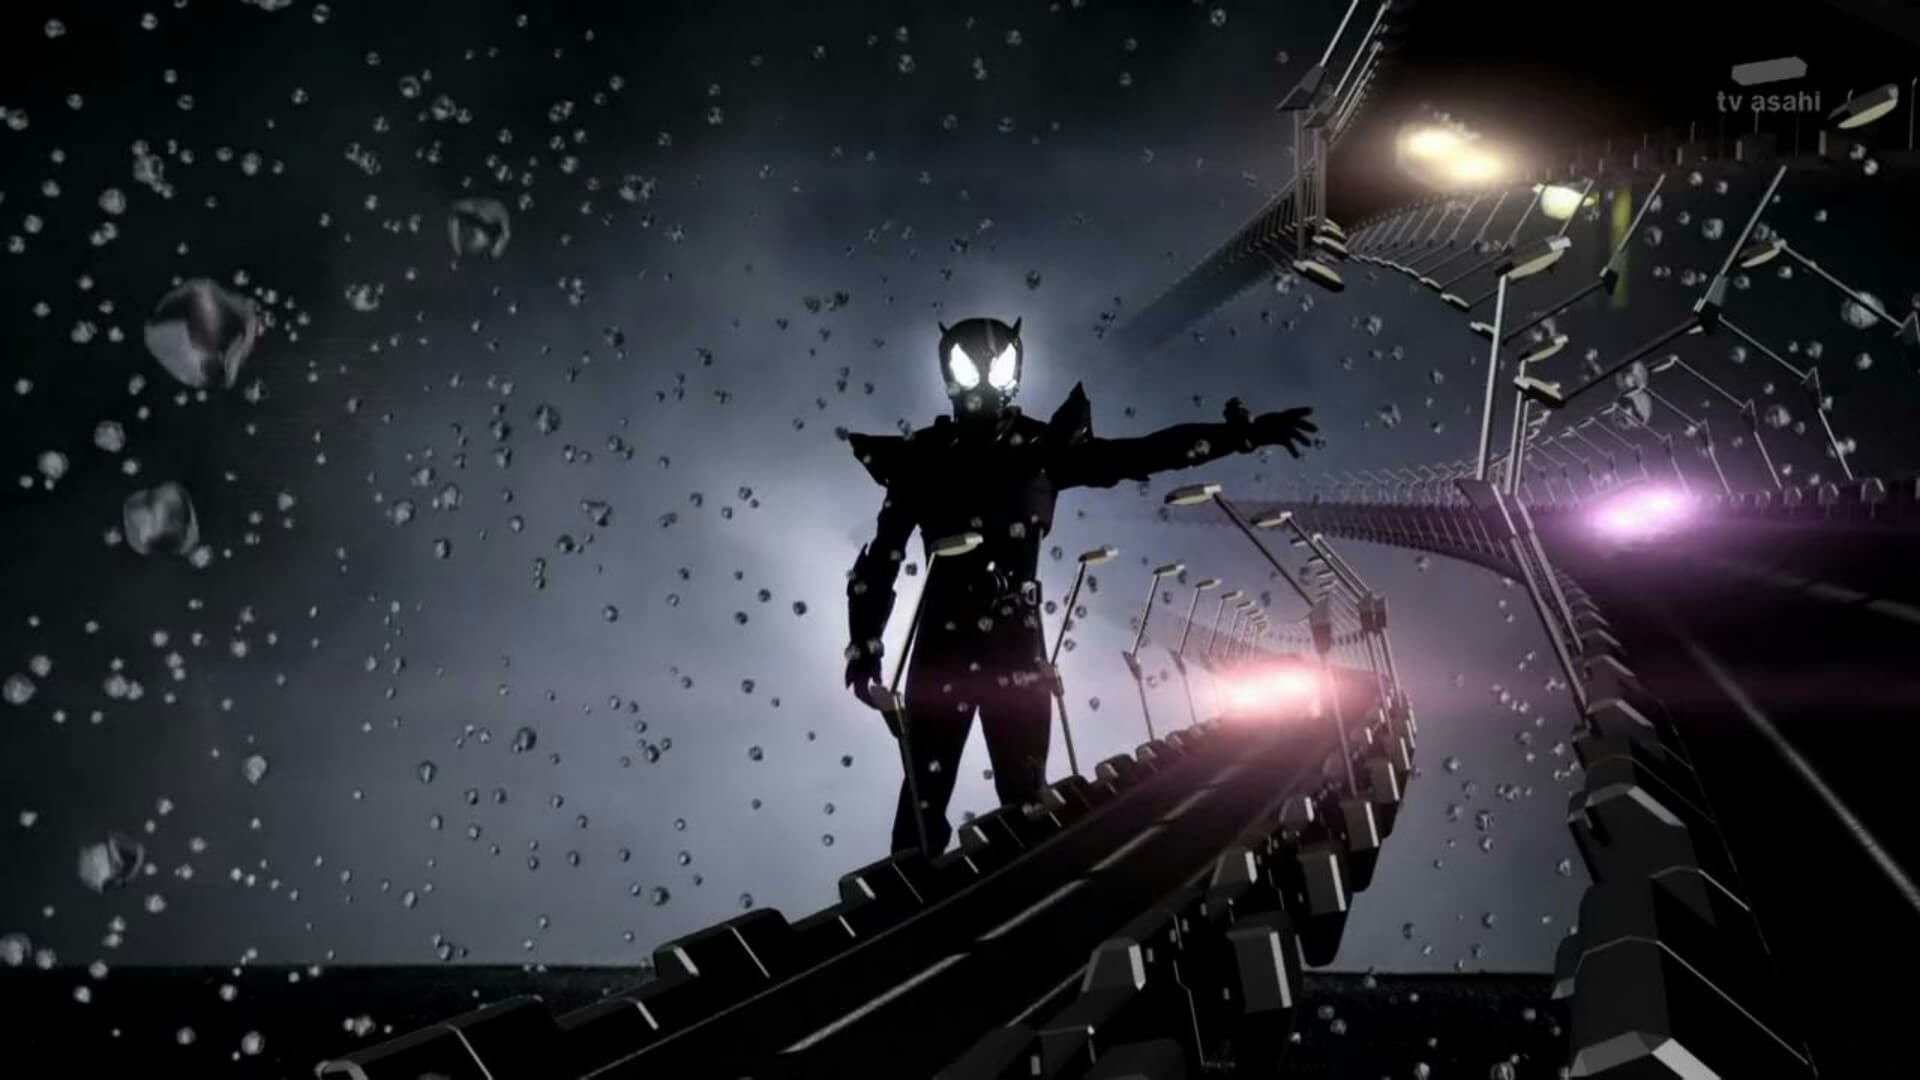 Kamen Rider - Super-1